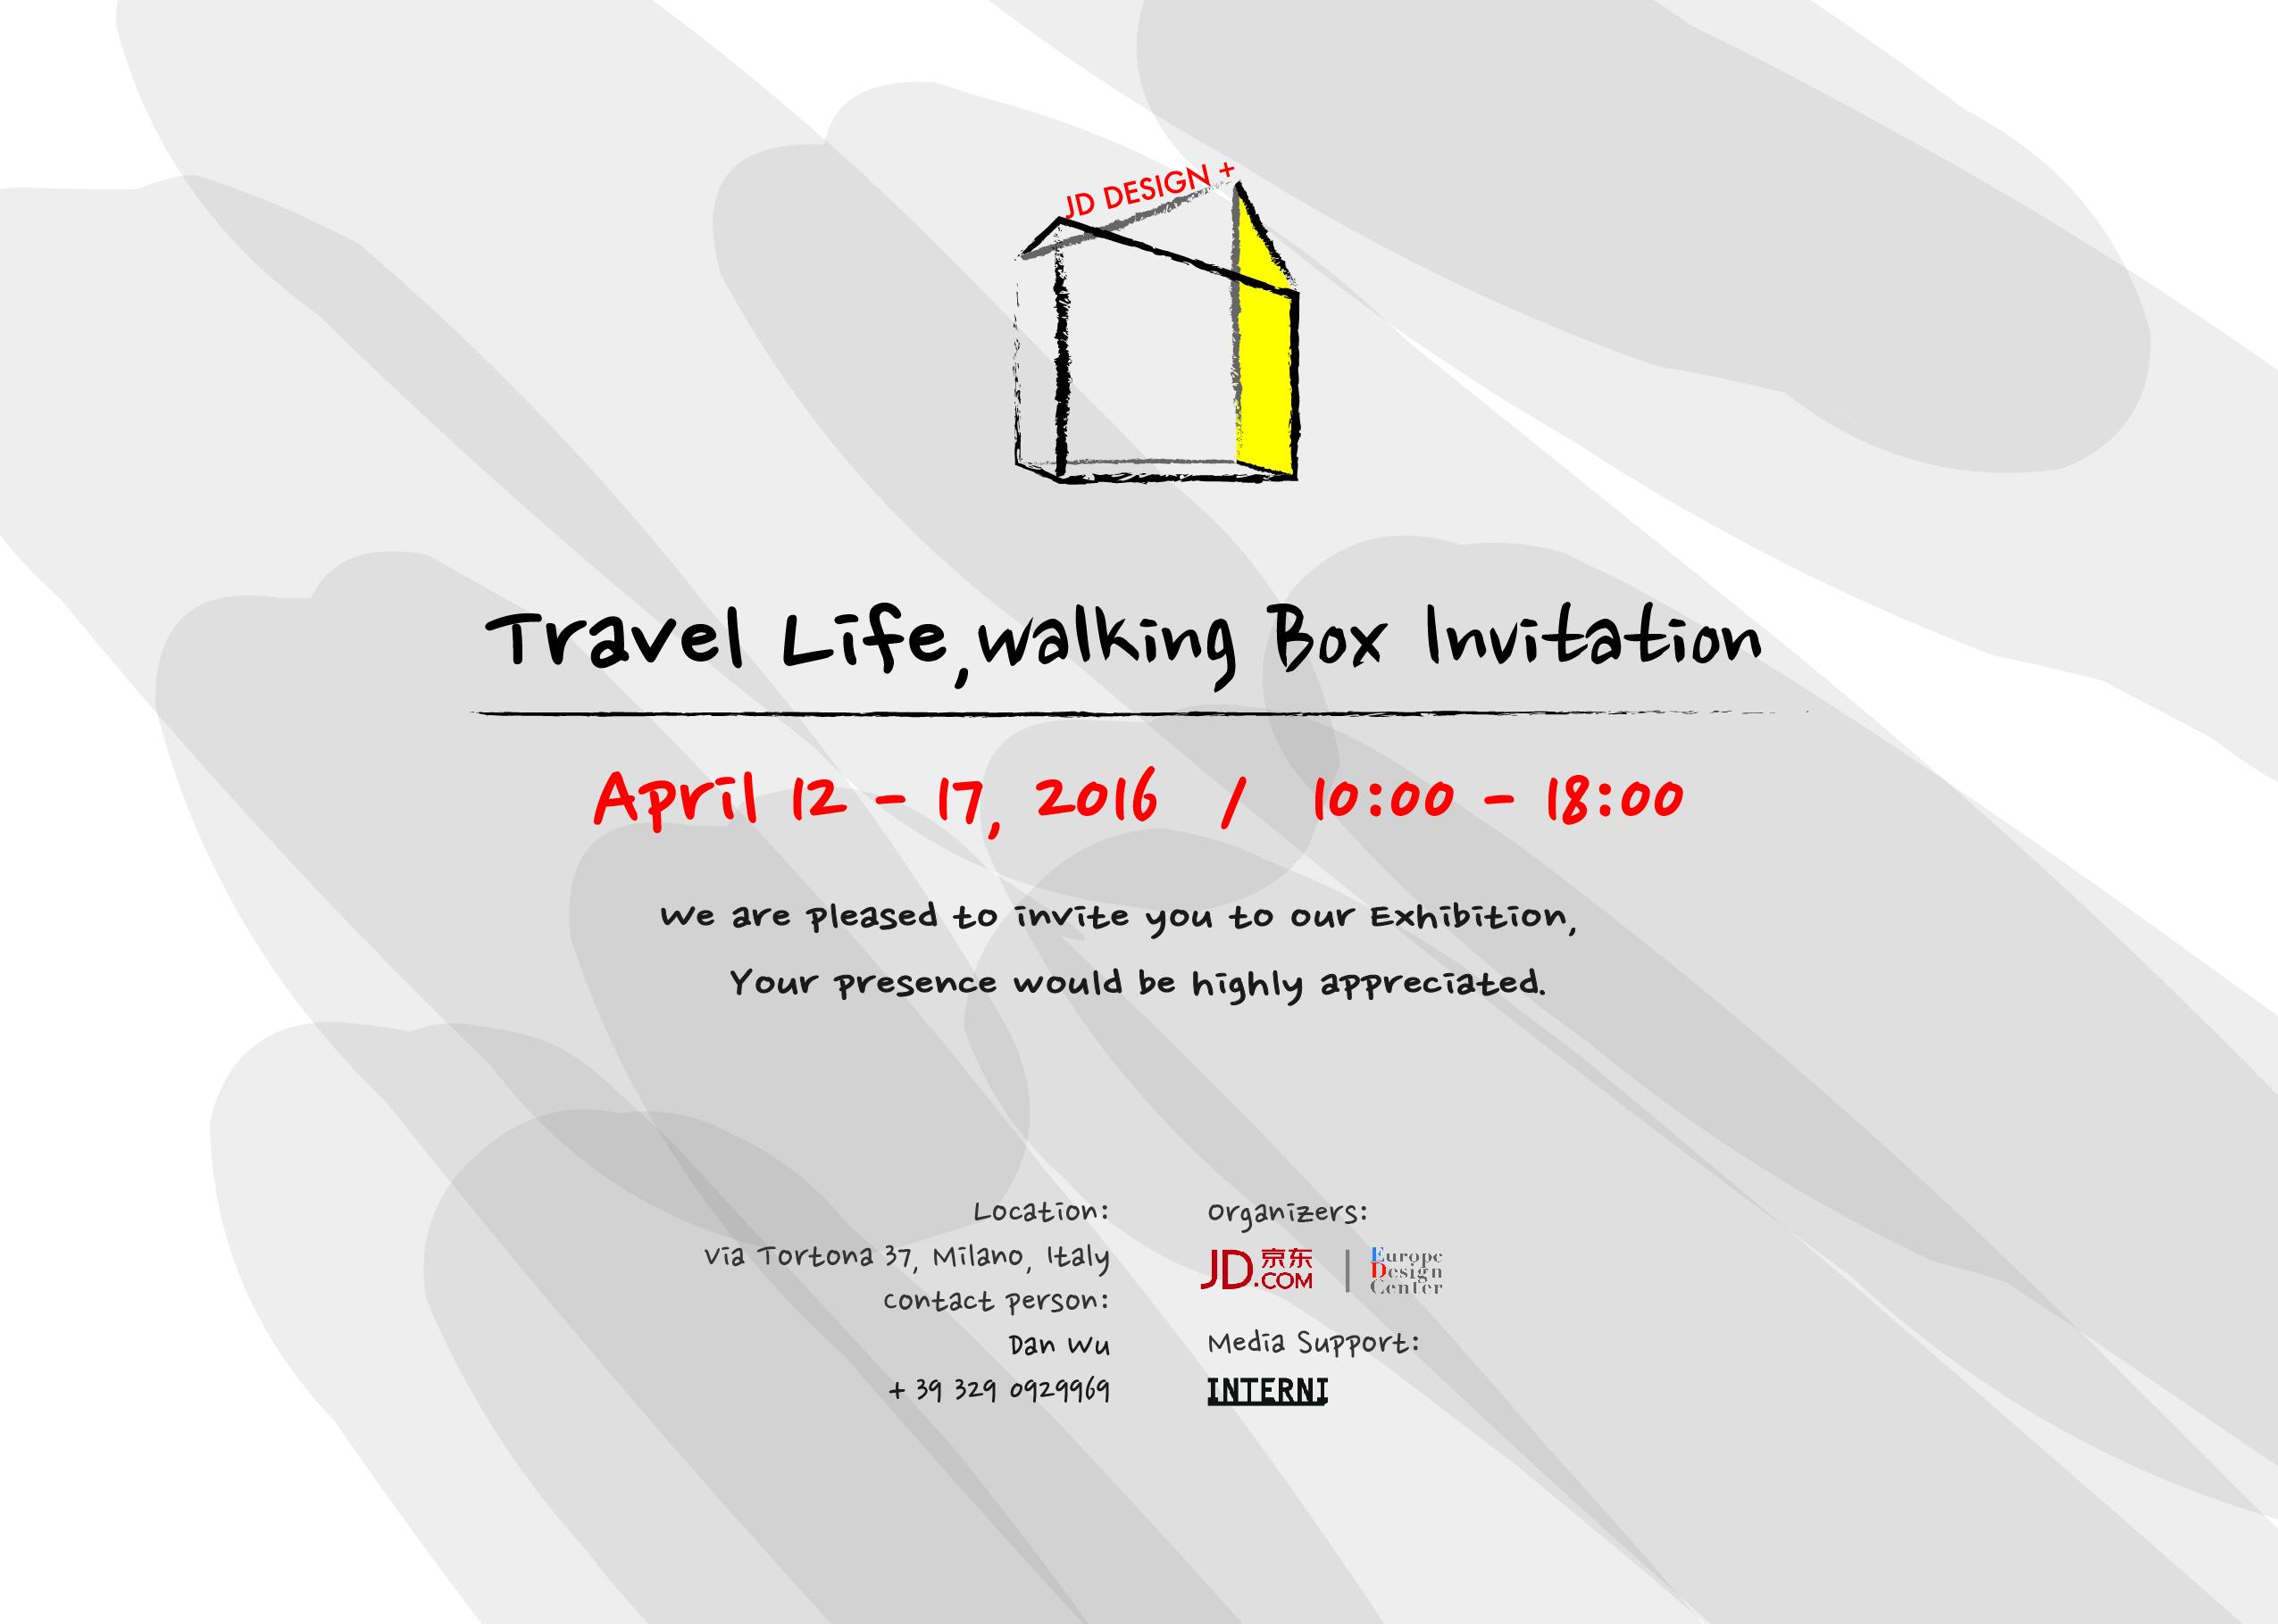 Europe Design Center presents TRAVEL LIFE - WALKING BOX